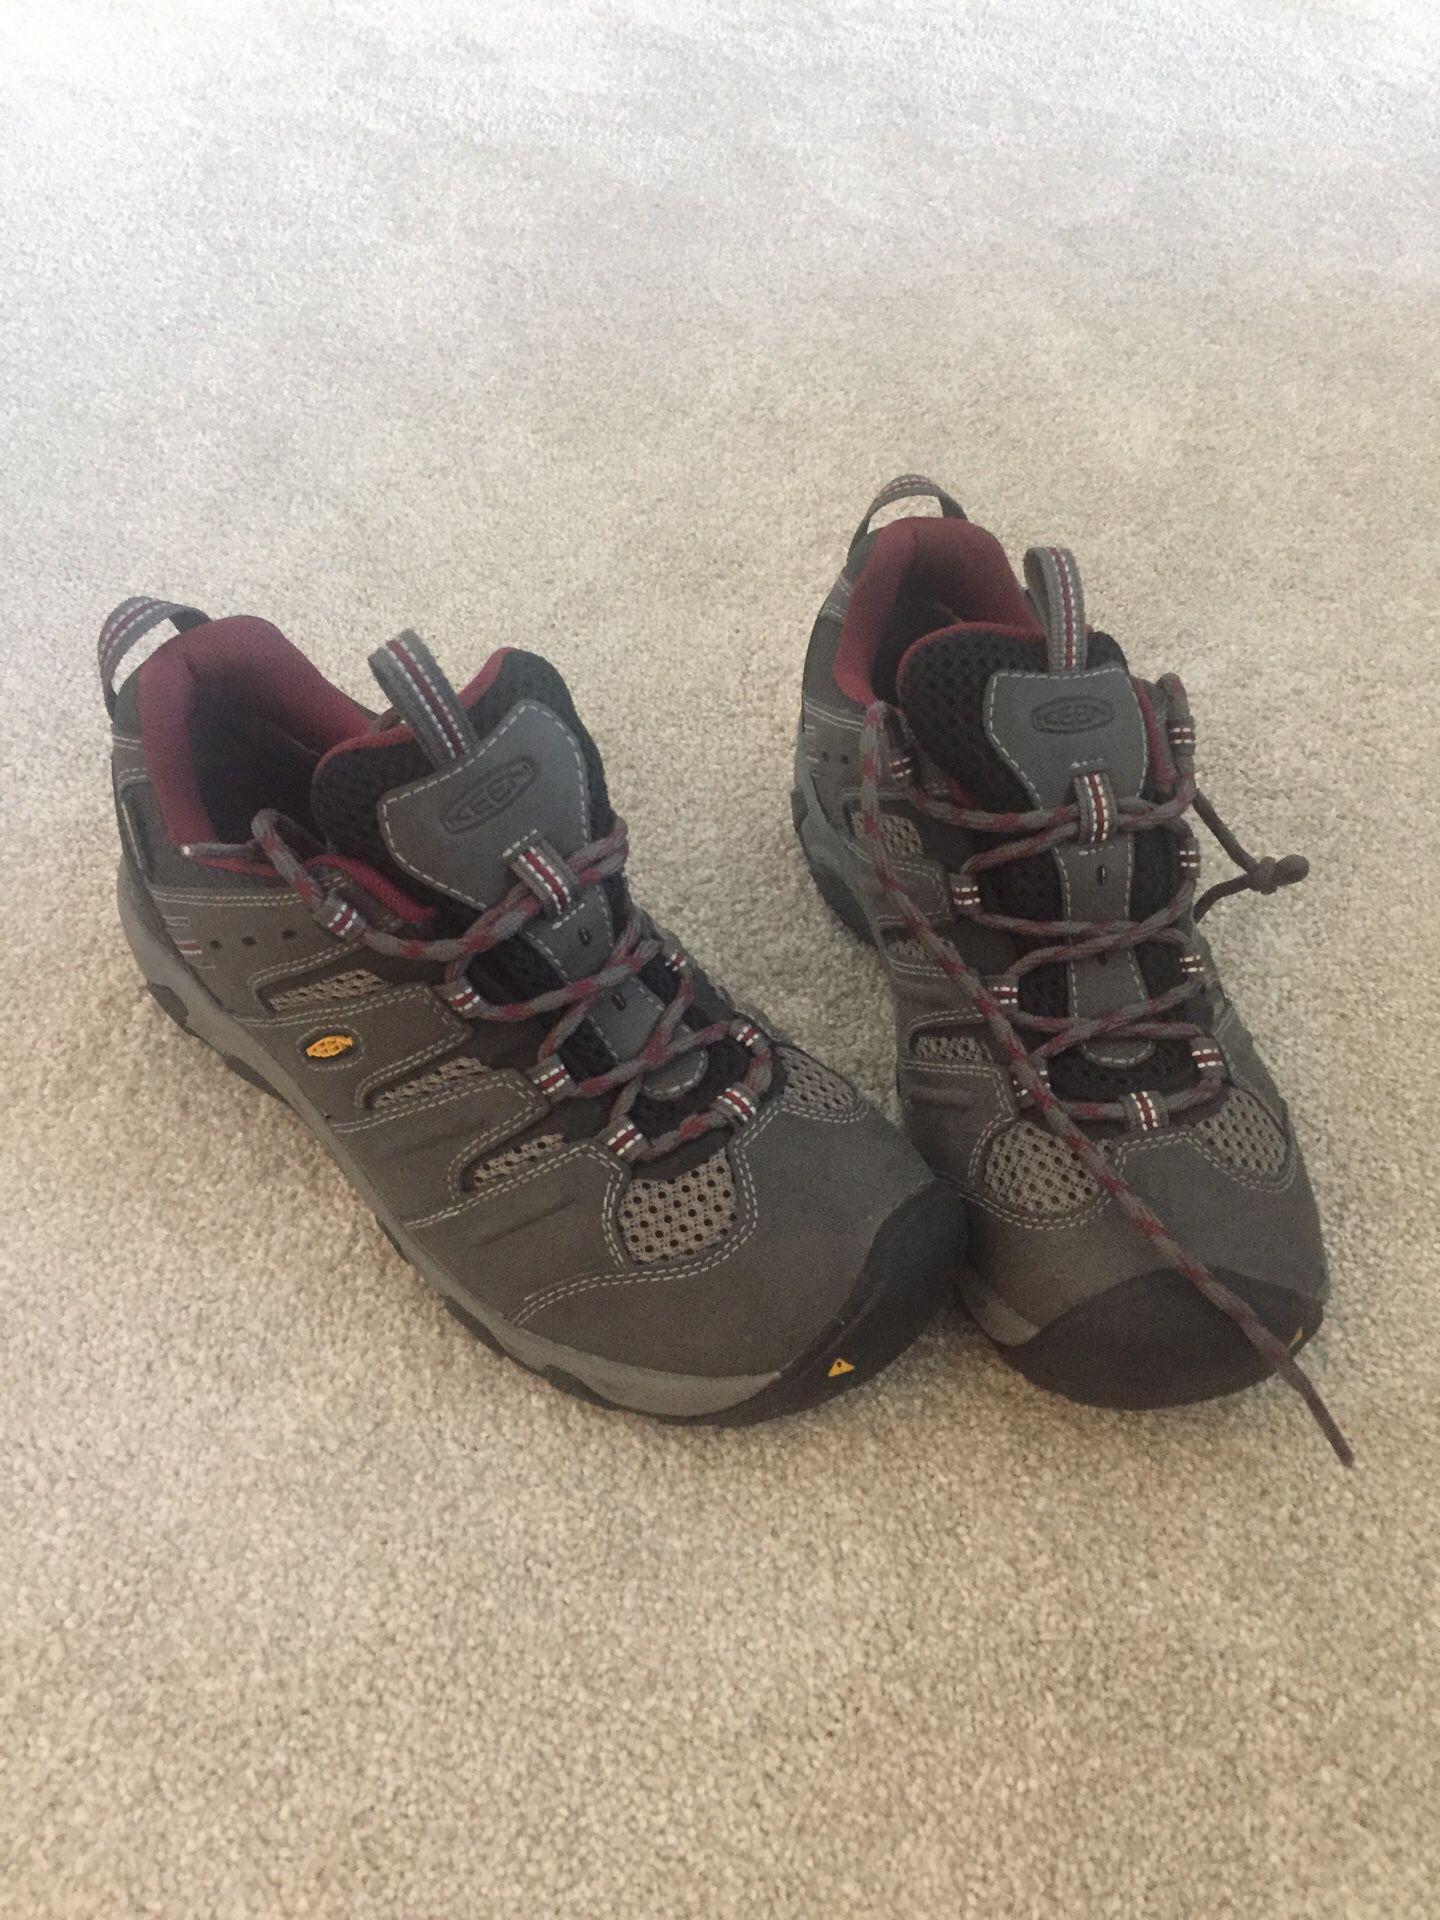 Women's keen hiking boot size 8